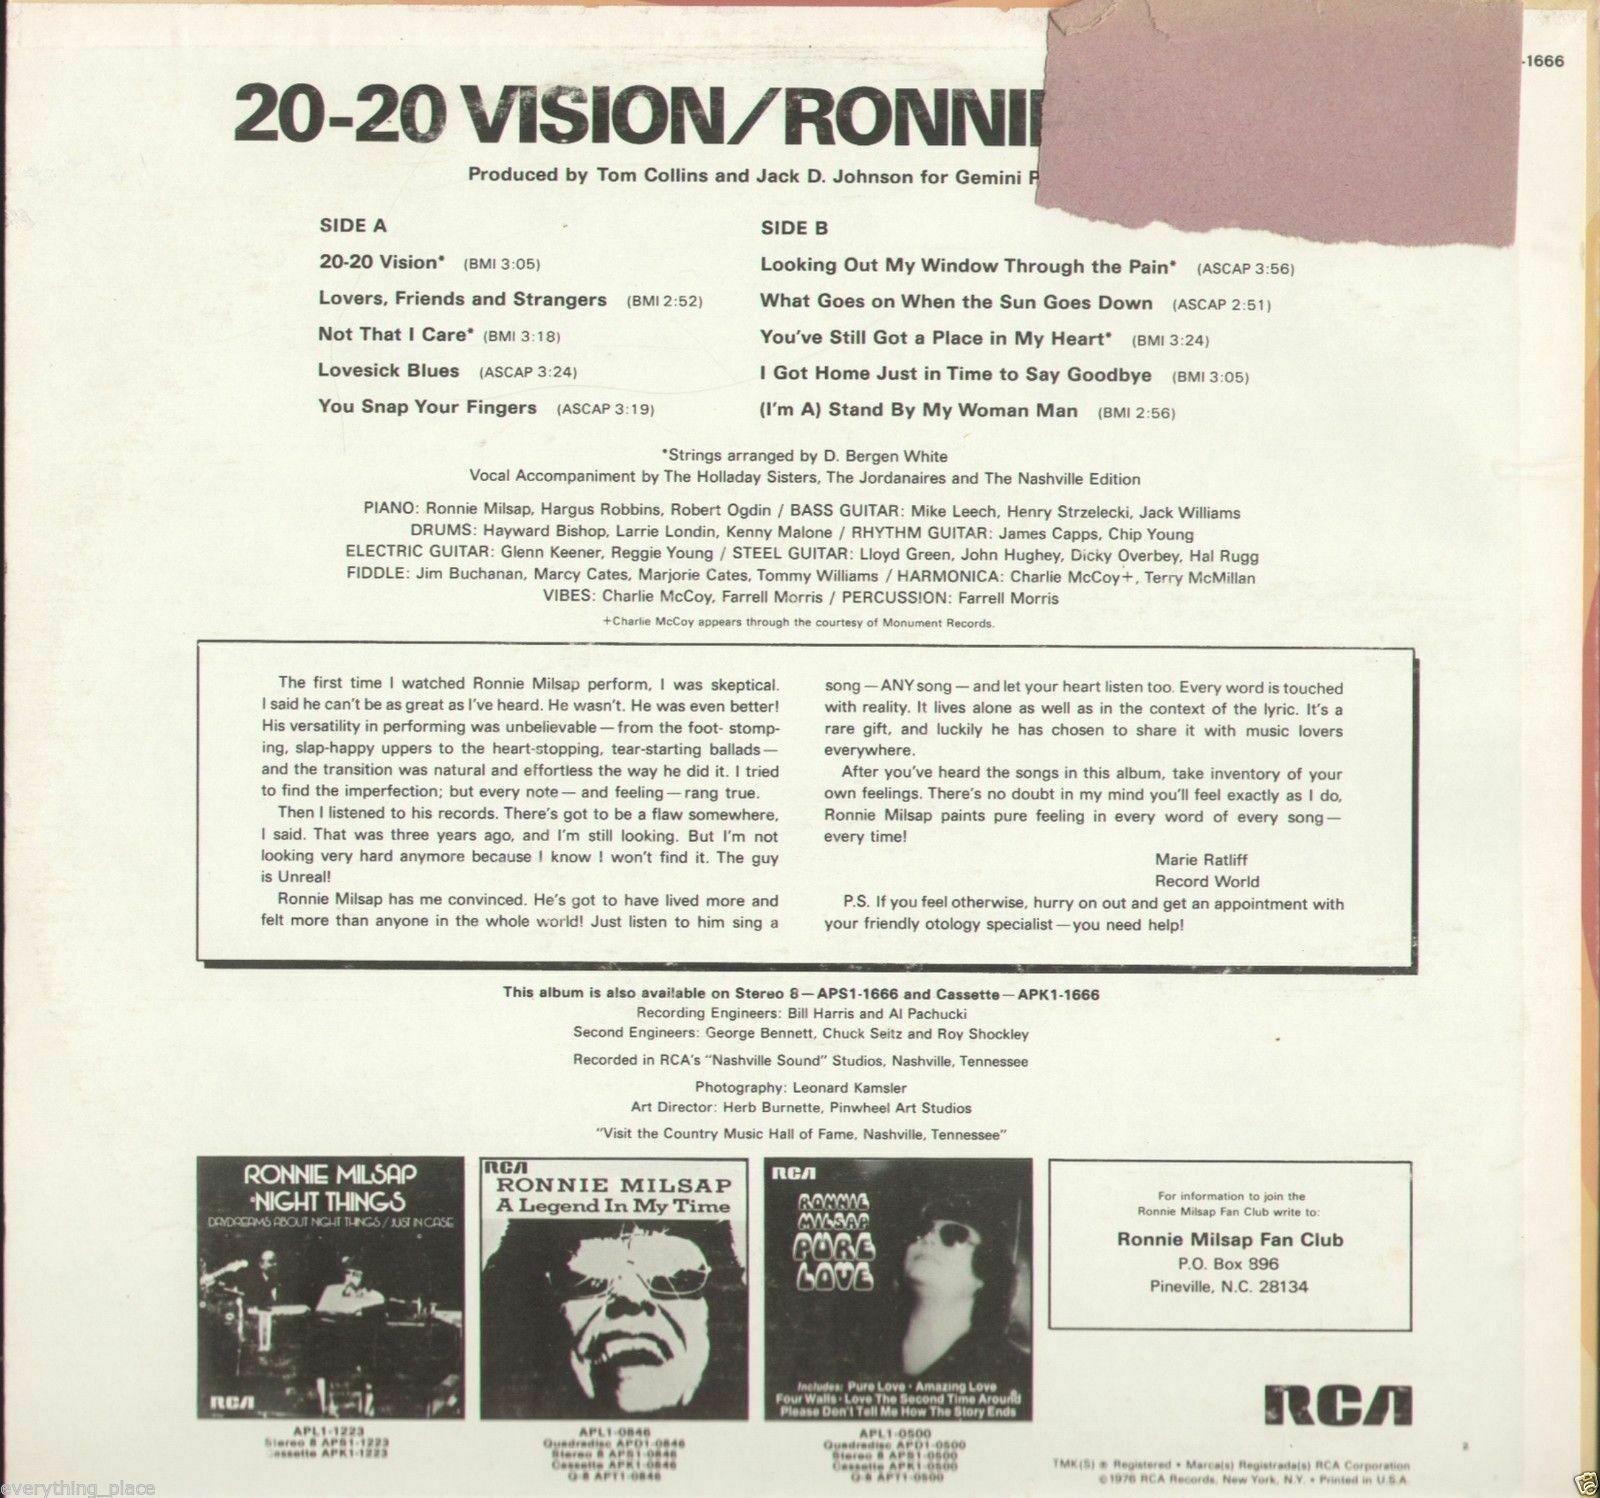 Ronnie Milsap 20-20 Vision Vinyl Record Album